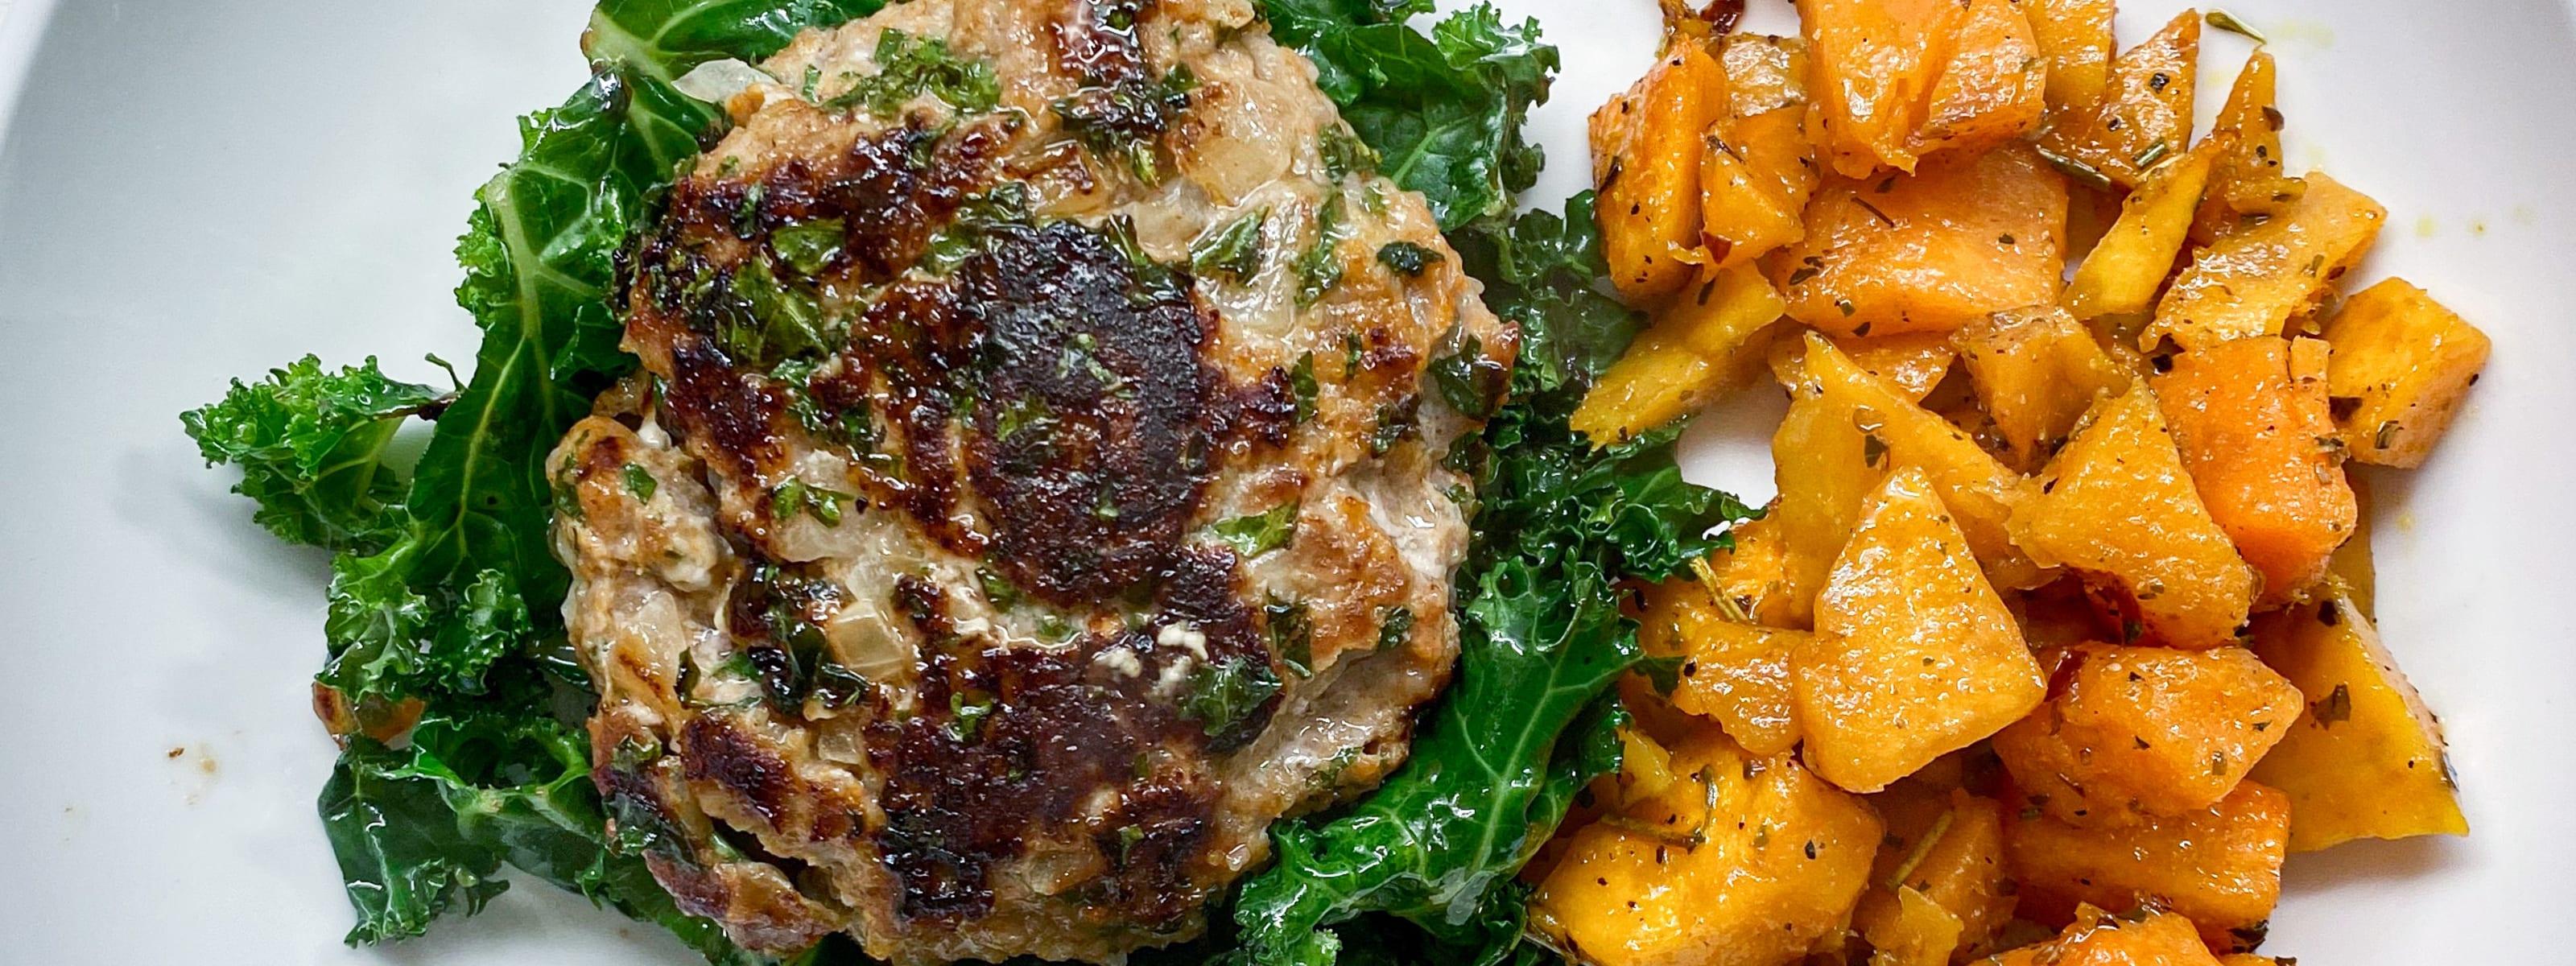 Feta Kale Turkey Burgers